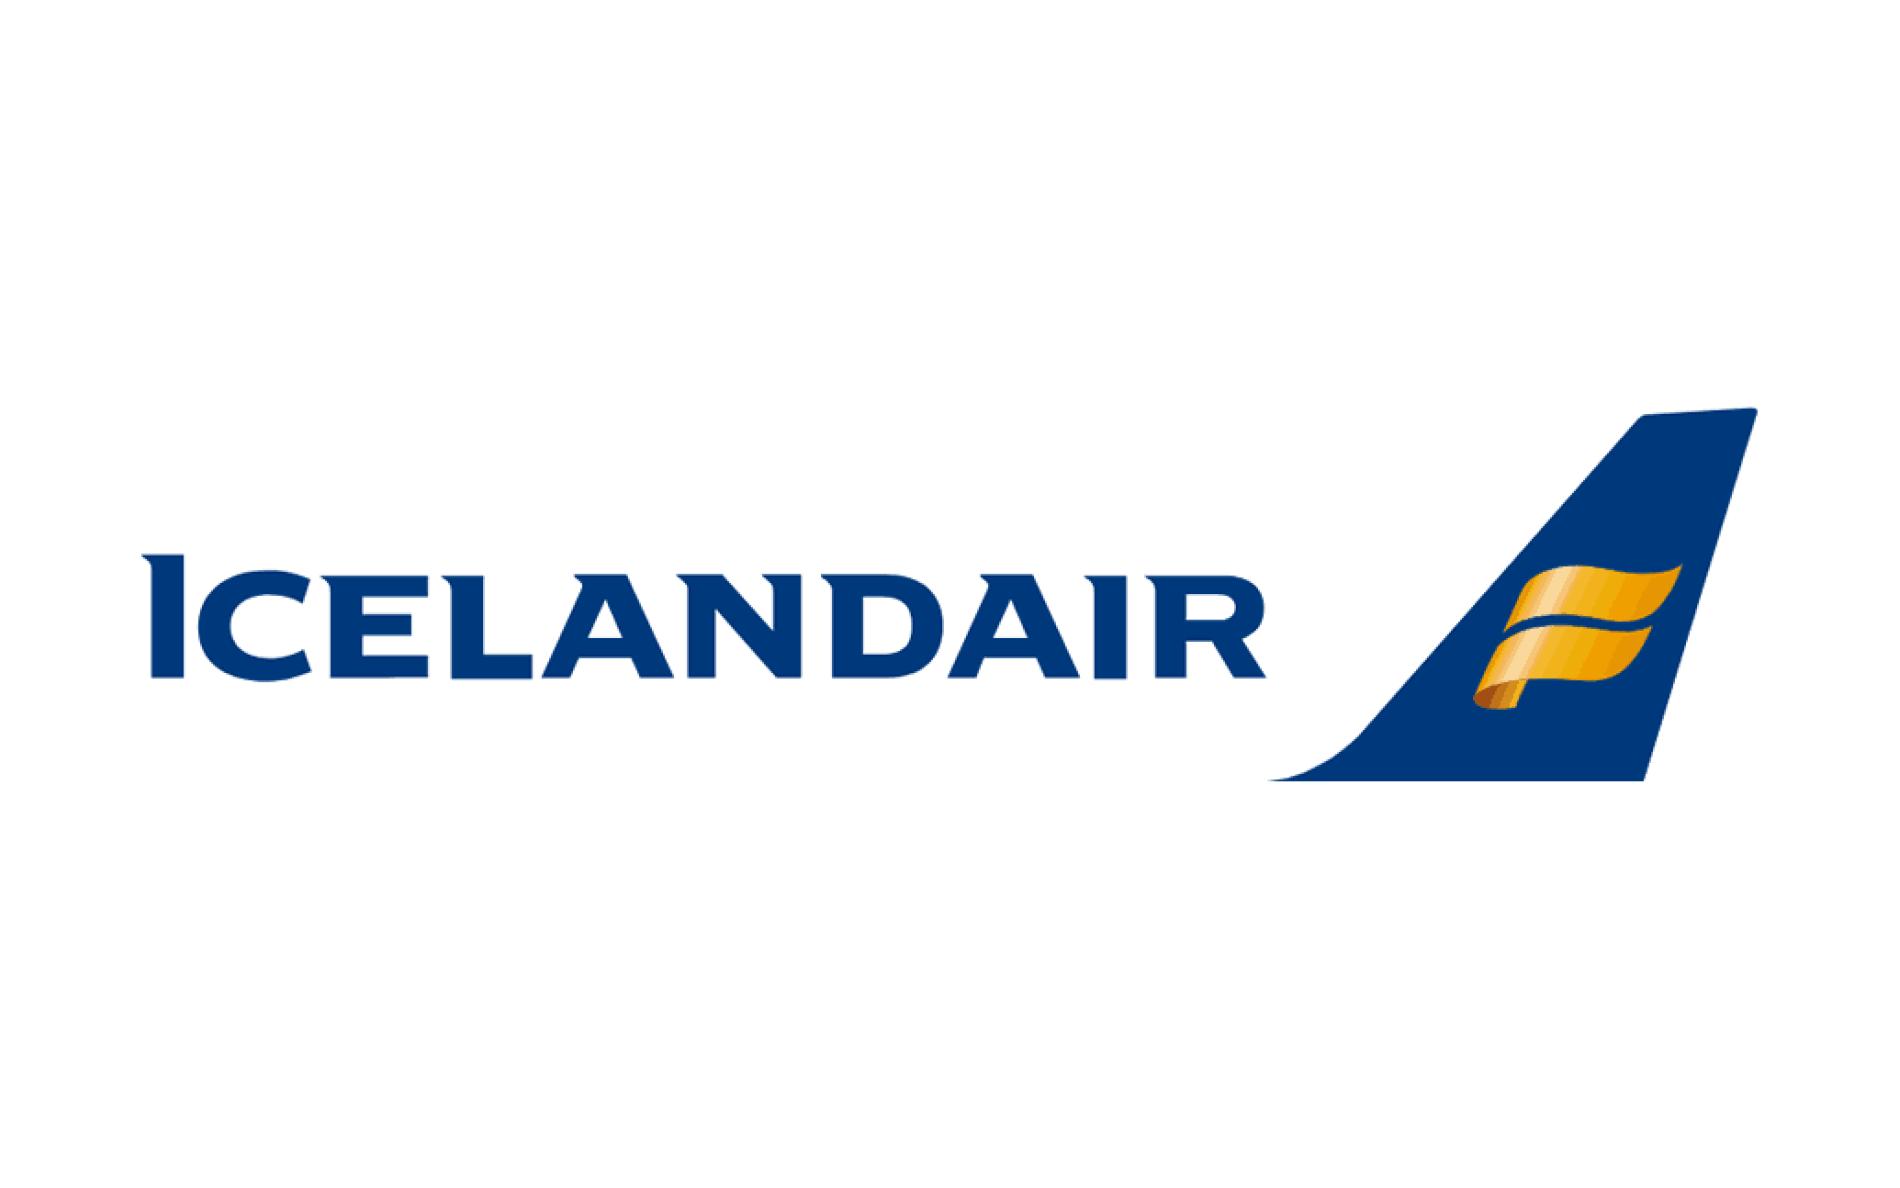 icelandair 2021